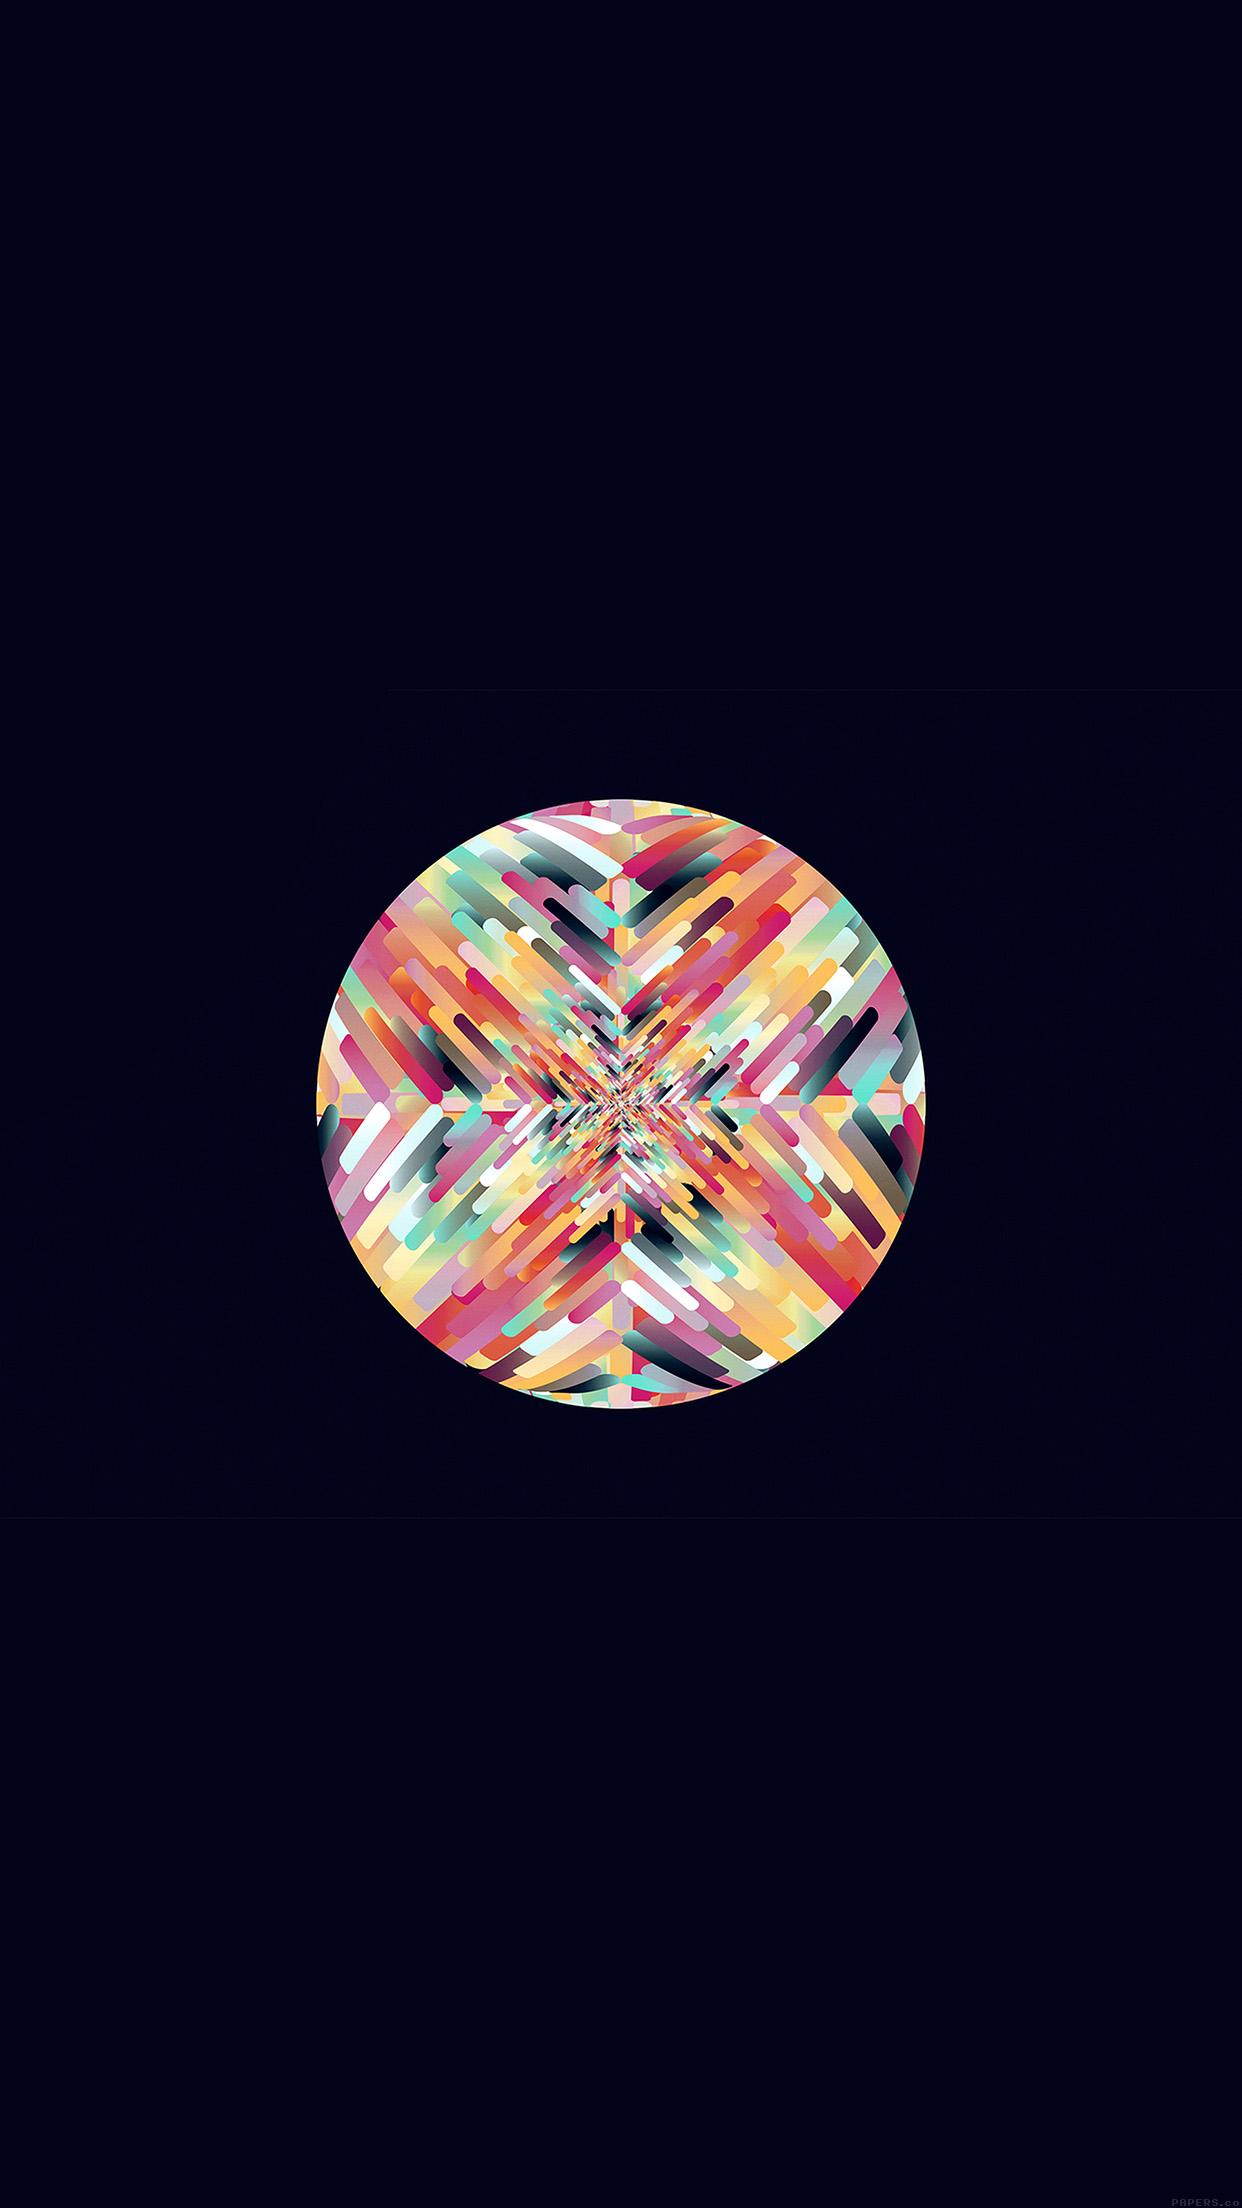 Crystal Diamond Silver Golden Round Flower Heart Anklet: IPhone SE